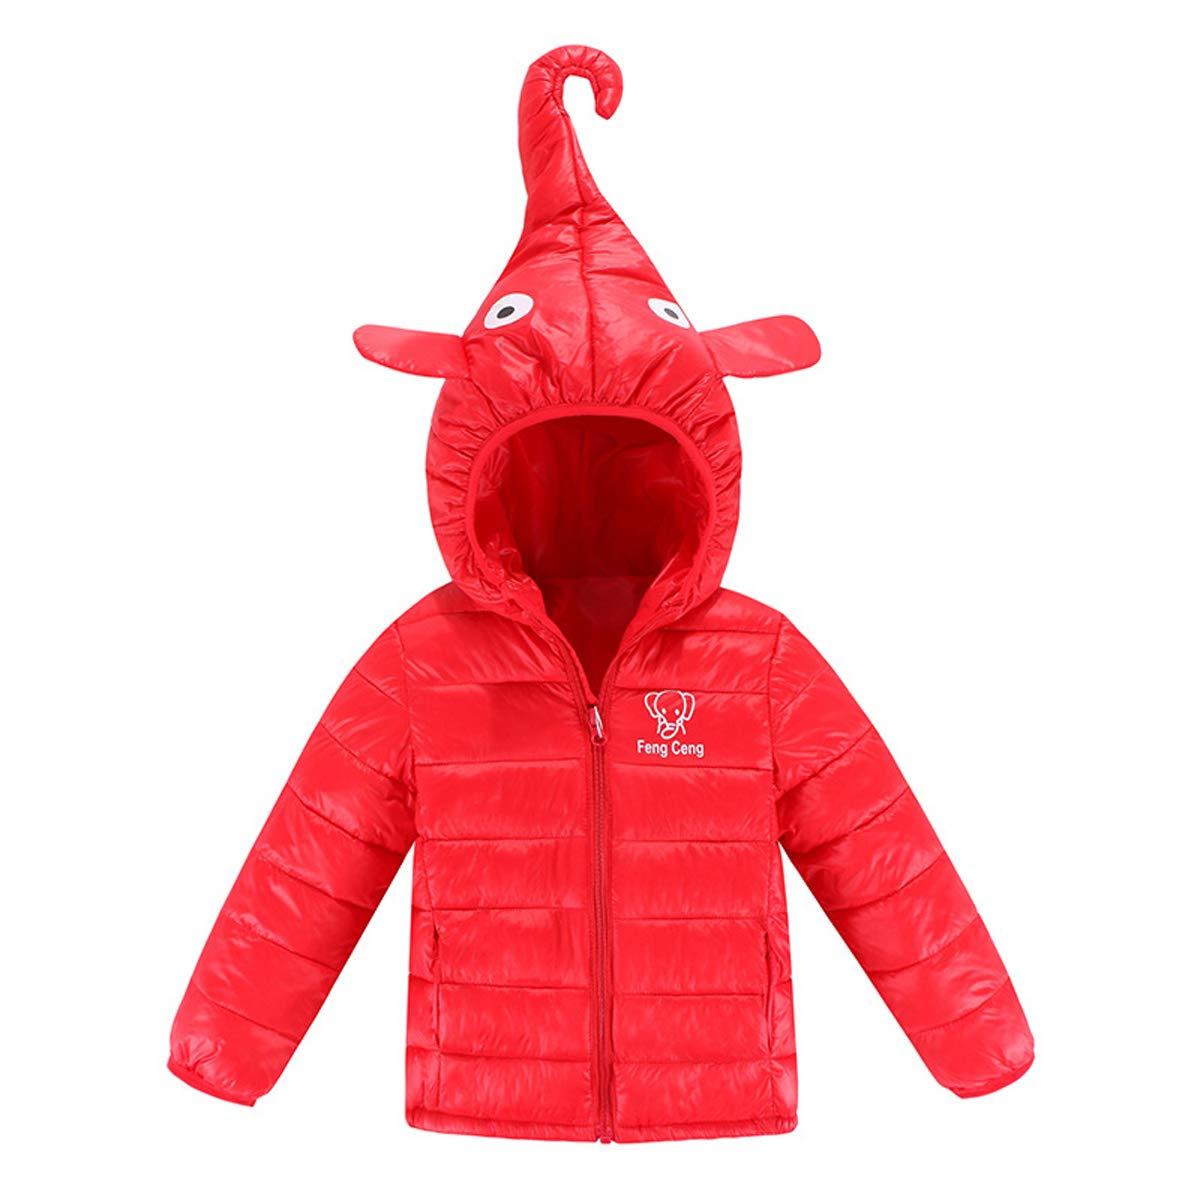 BenCreative Kids Boys Girls Hooded Jacket Cute Cartoon Elephant Nose Coat Winter Light Down Outerwear for 1-6 Years 181114QBMF